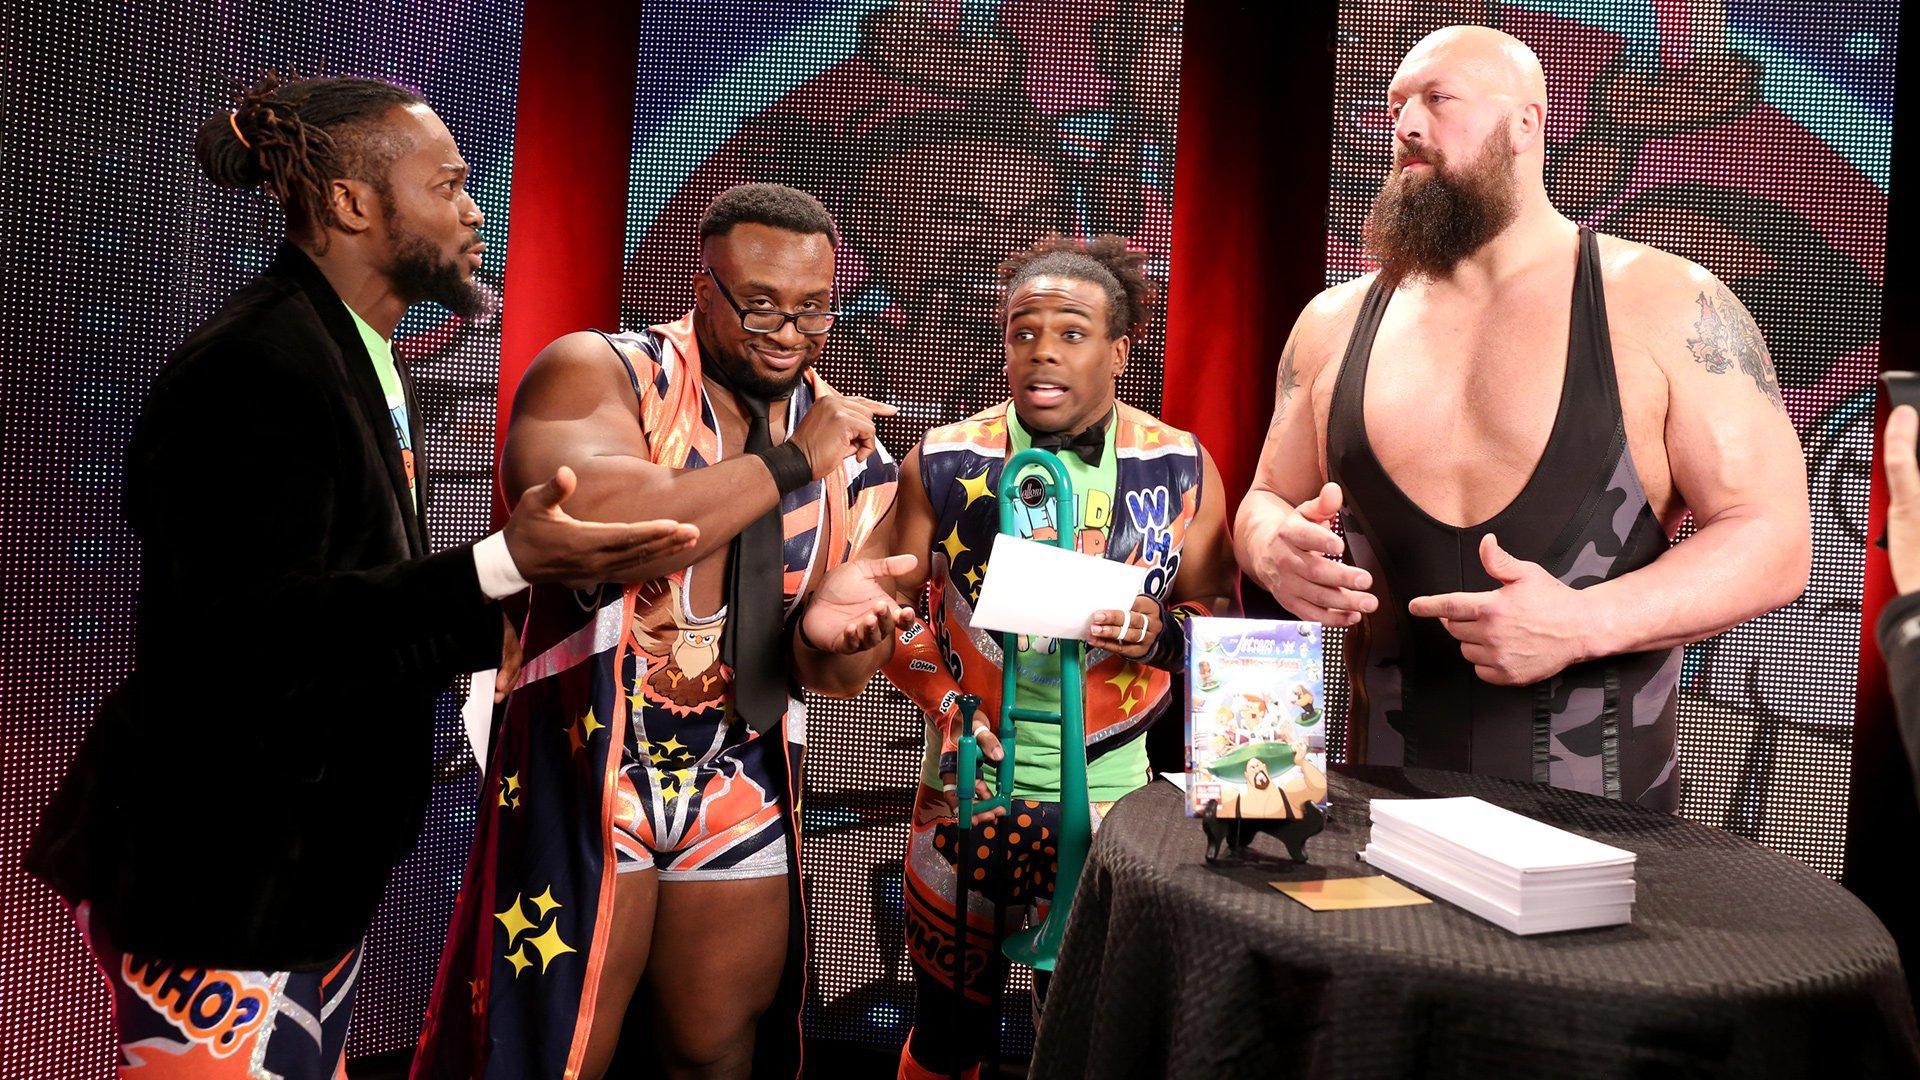 Big Show aconselhou Kofi Kingston a sair do New Day